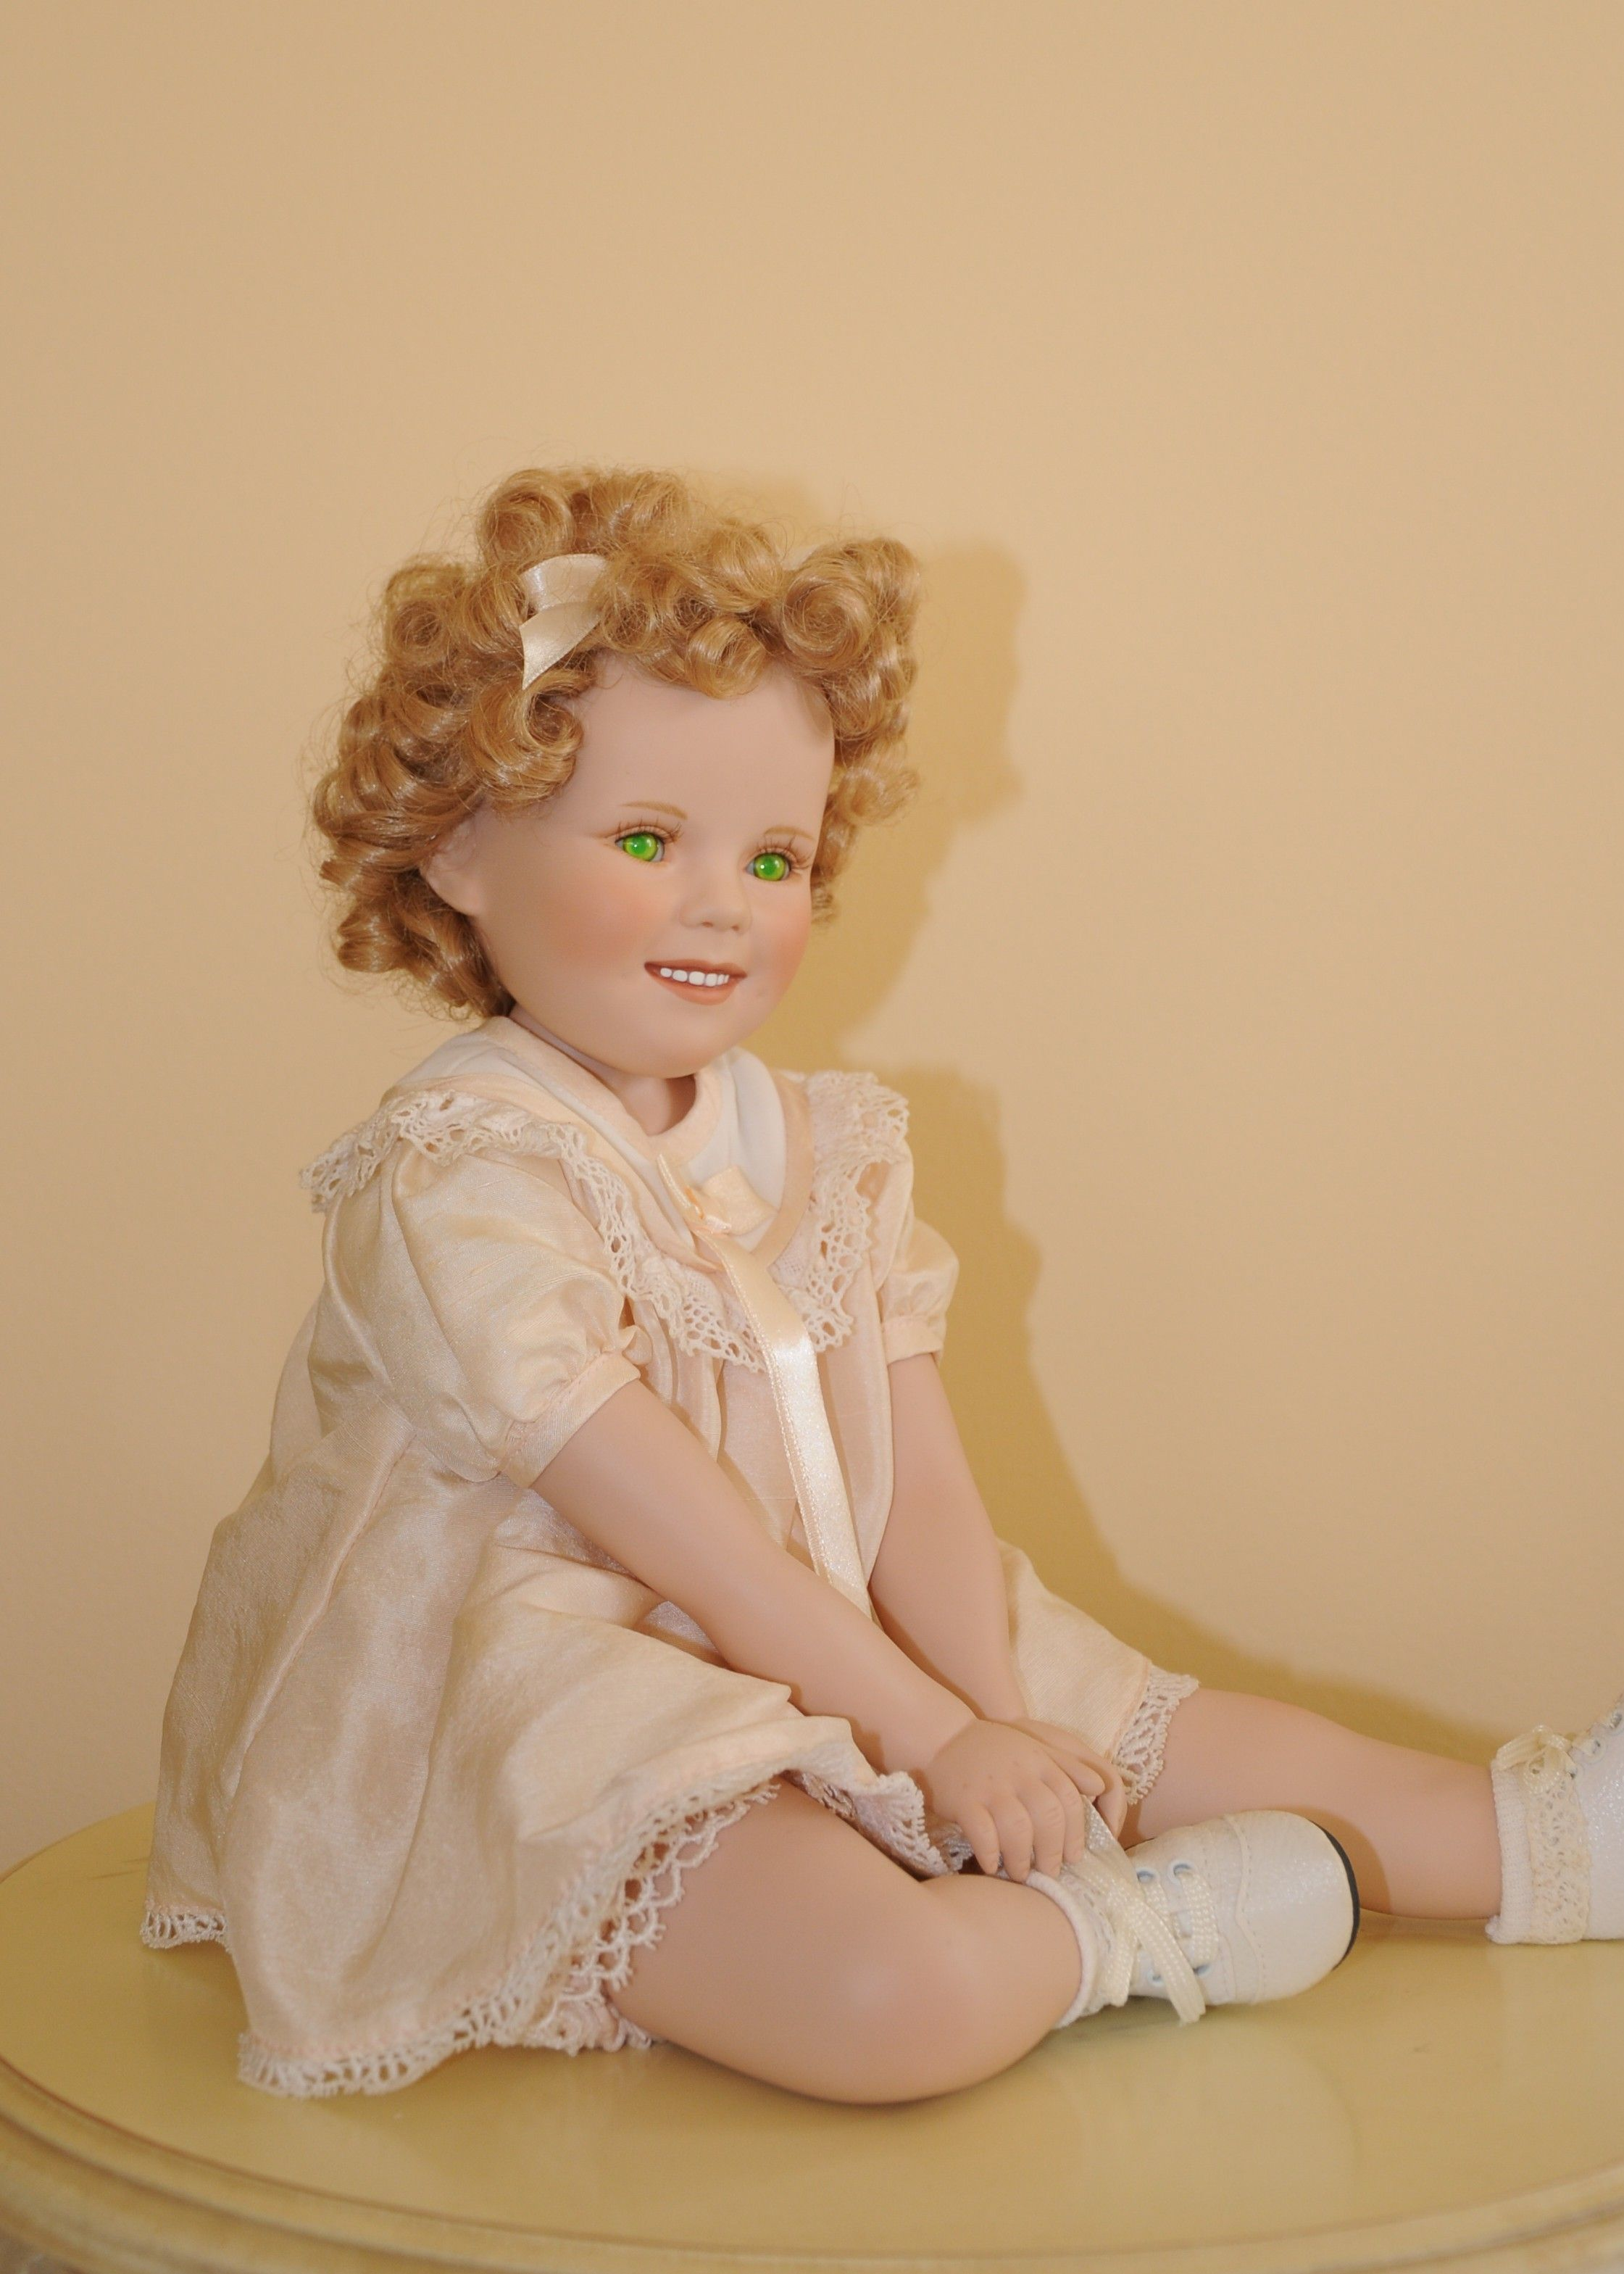 My Shirley Temple ceramic Doll from Danbury Mint - green eyes.